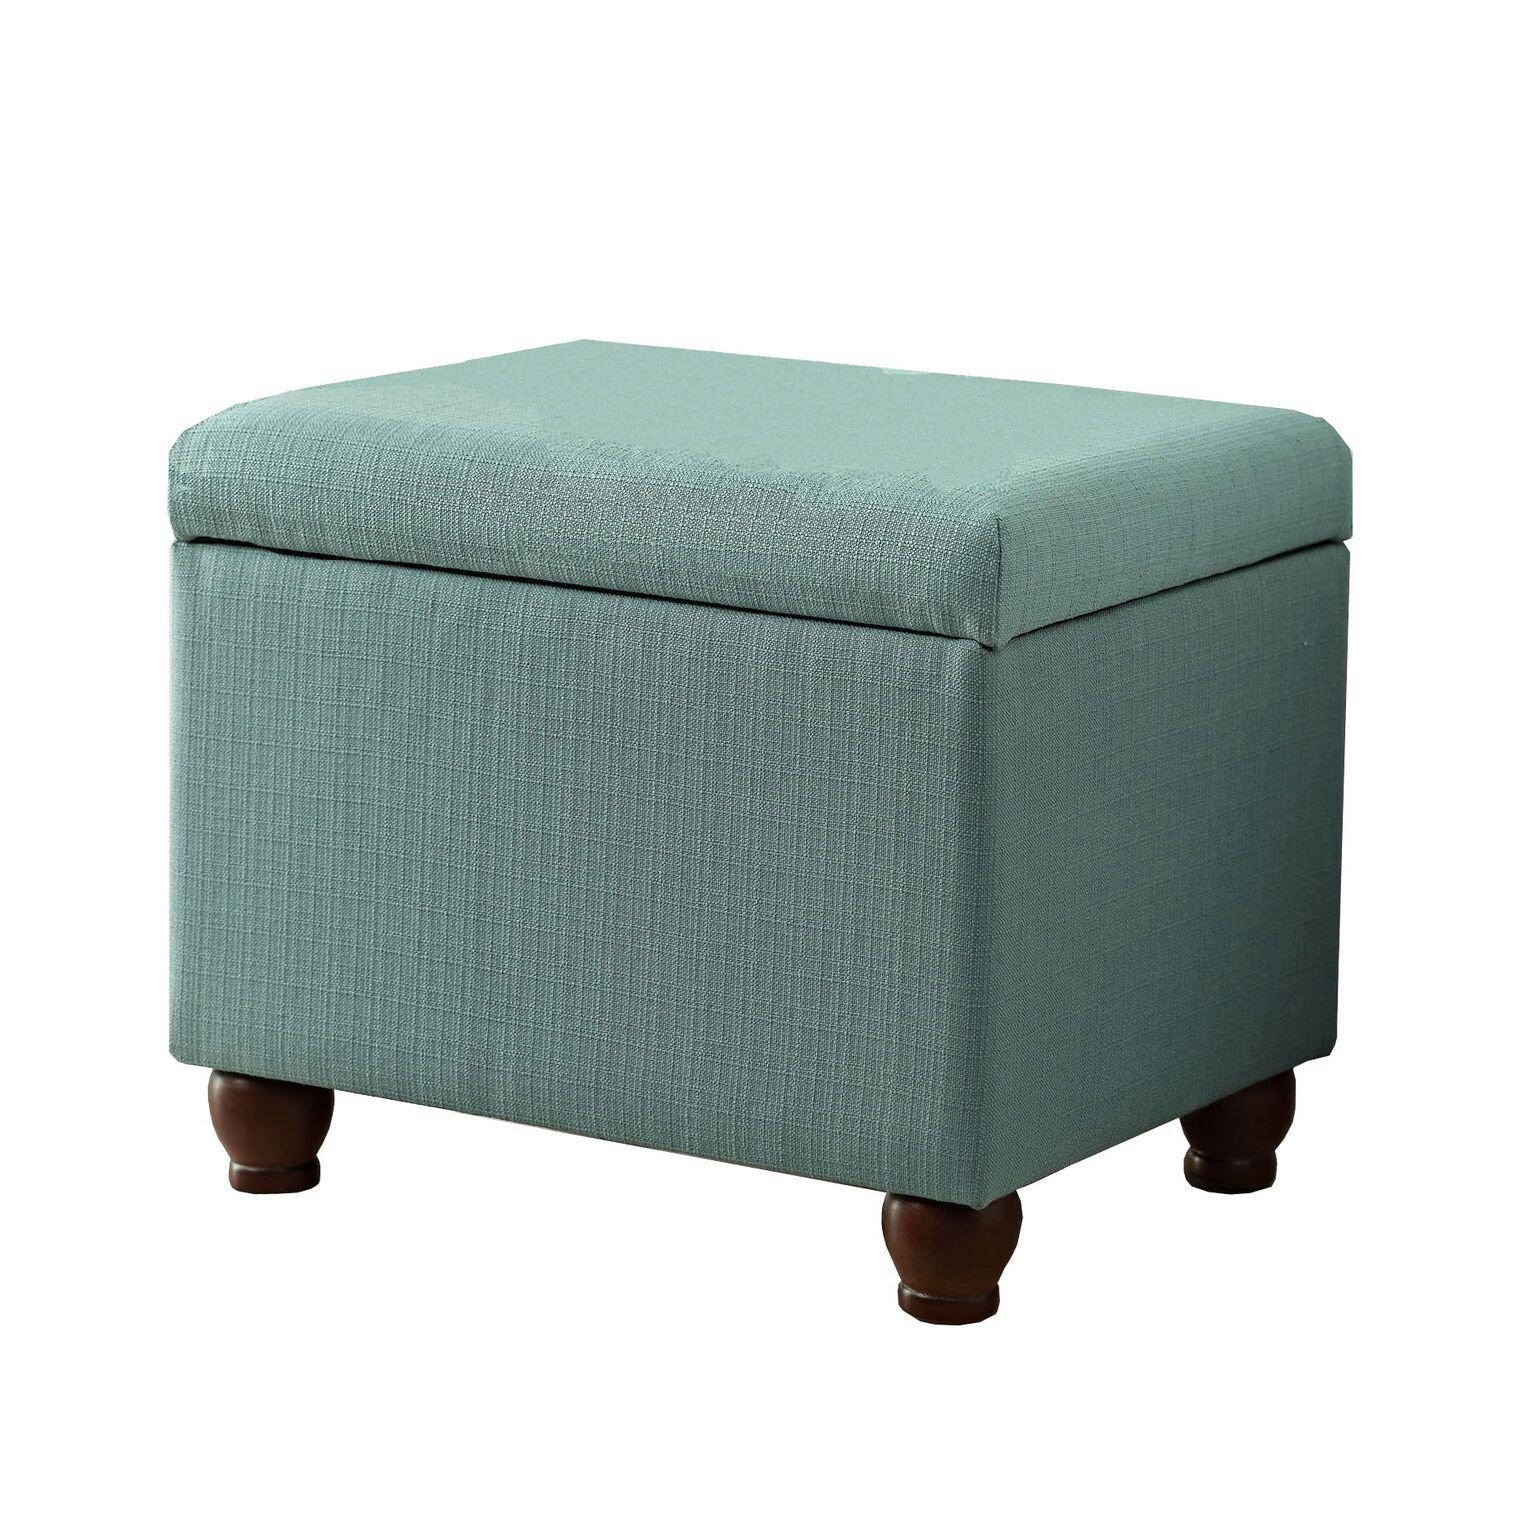 Homepop 6377 F1374 Ottoman Kinfine Decorative Storage 250